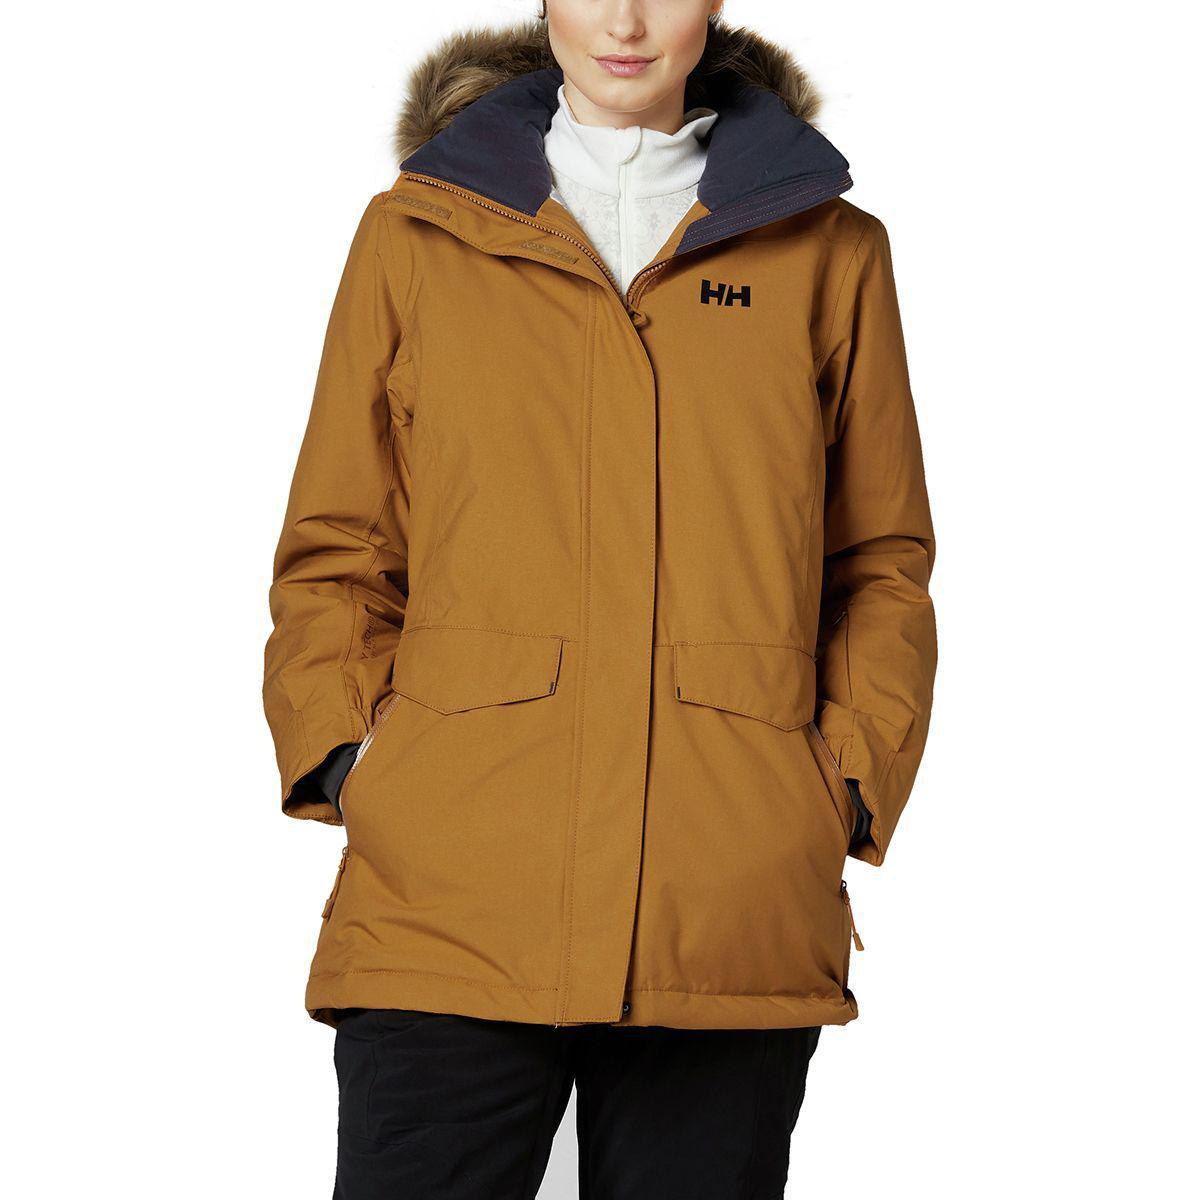 e0a192925c Helly Hansen. Women s Snowbird Jacket